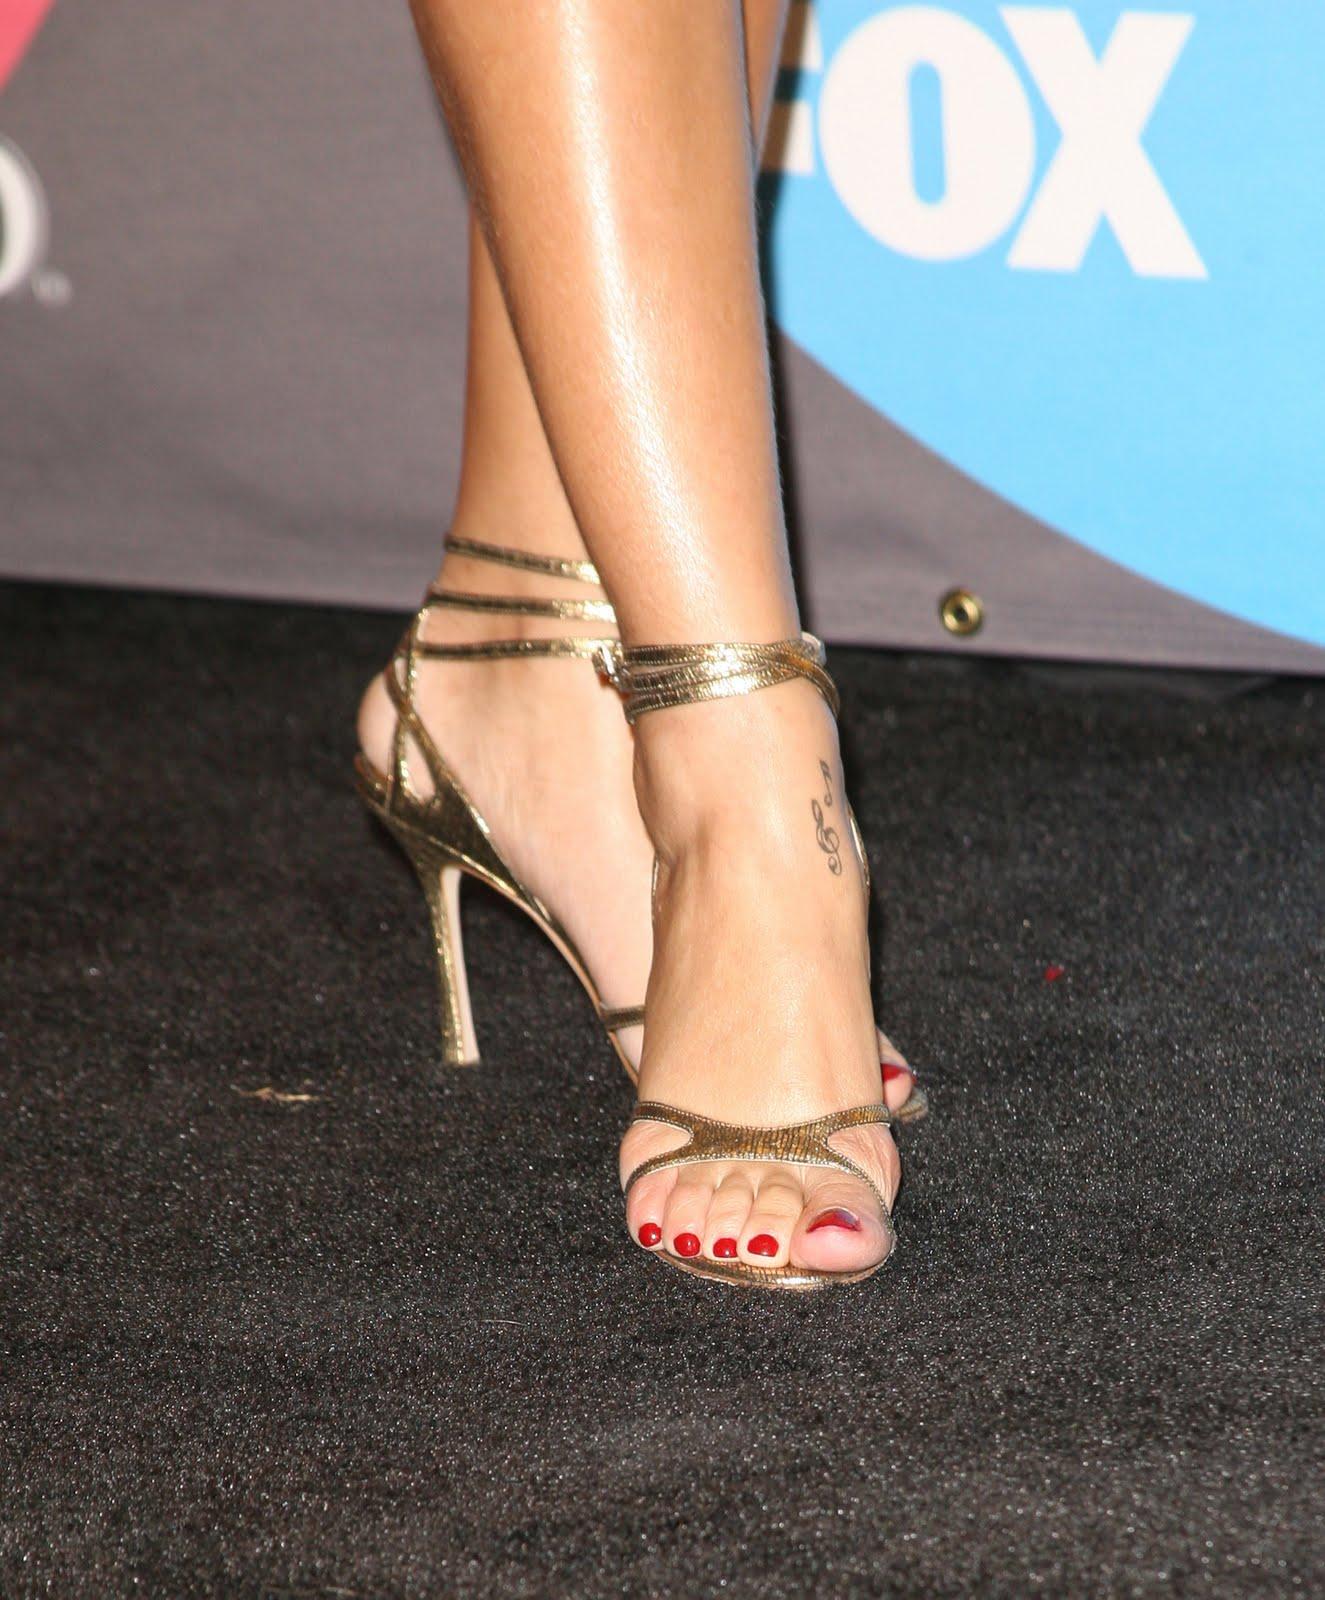 http://3.bp.blogspot.com/-5hpXsbgosuw/TihMpfxZoYI/AAAAAAAABjw/t8myK2JYyLI/s1600/Rihanna-Feet-347846.jpg